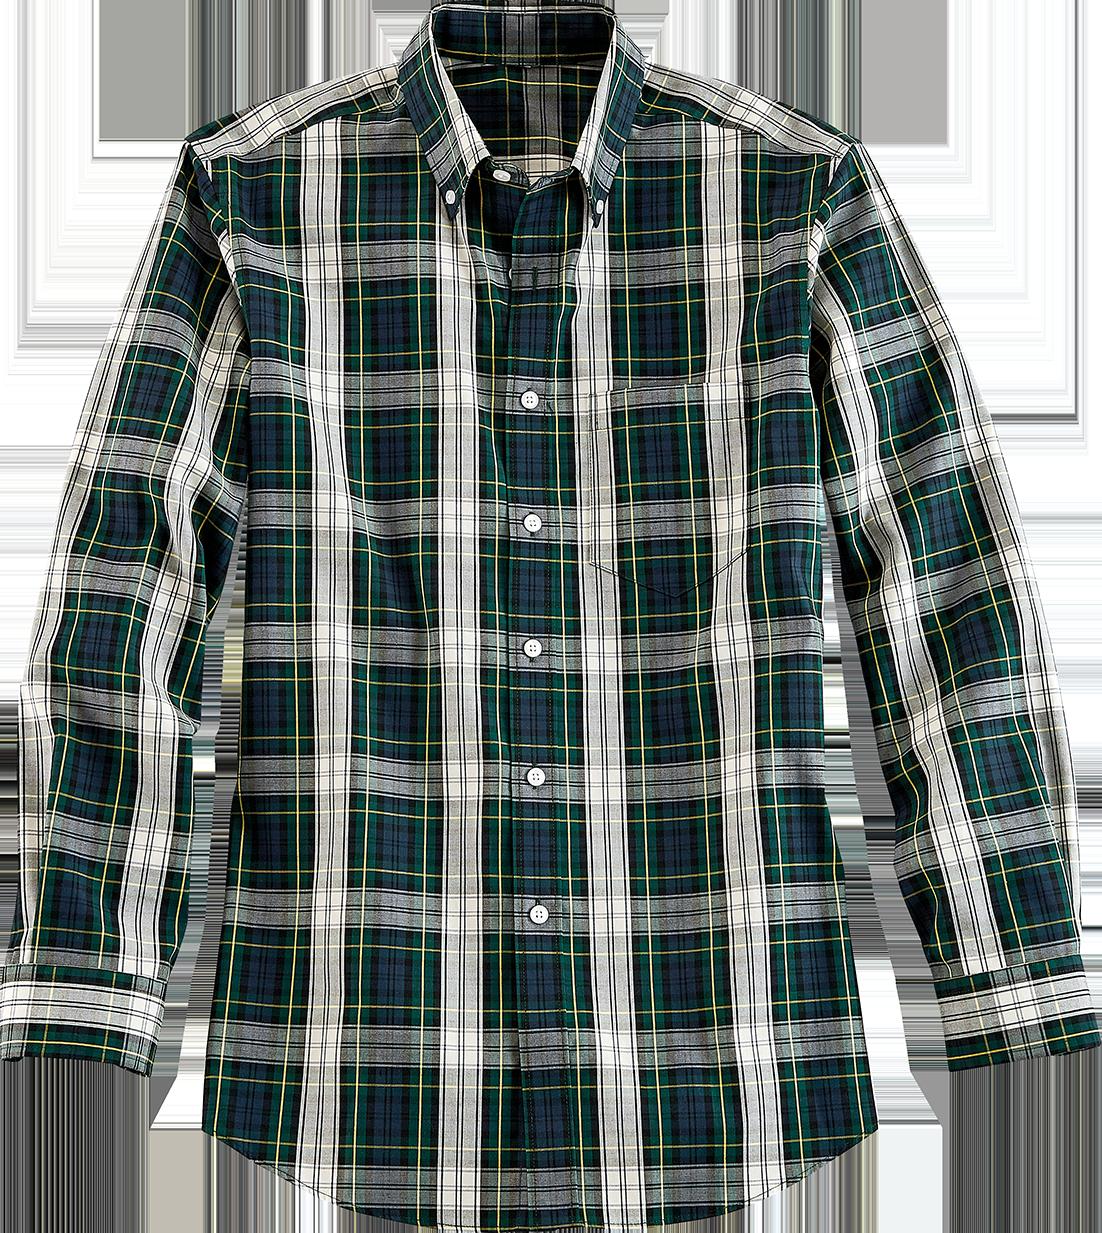 Orton Brothers Wrinkle-Free Long-Sleeve Tartan Oxford Shirt for Men